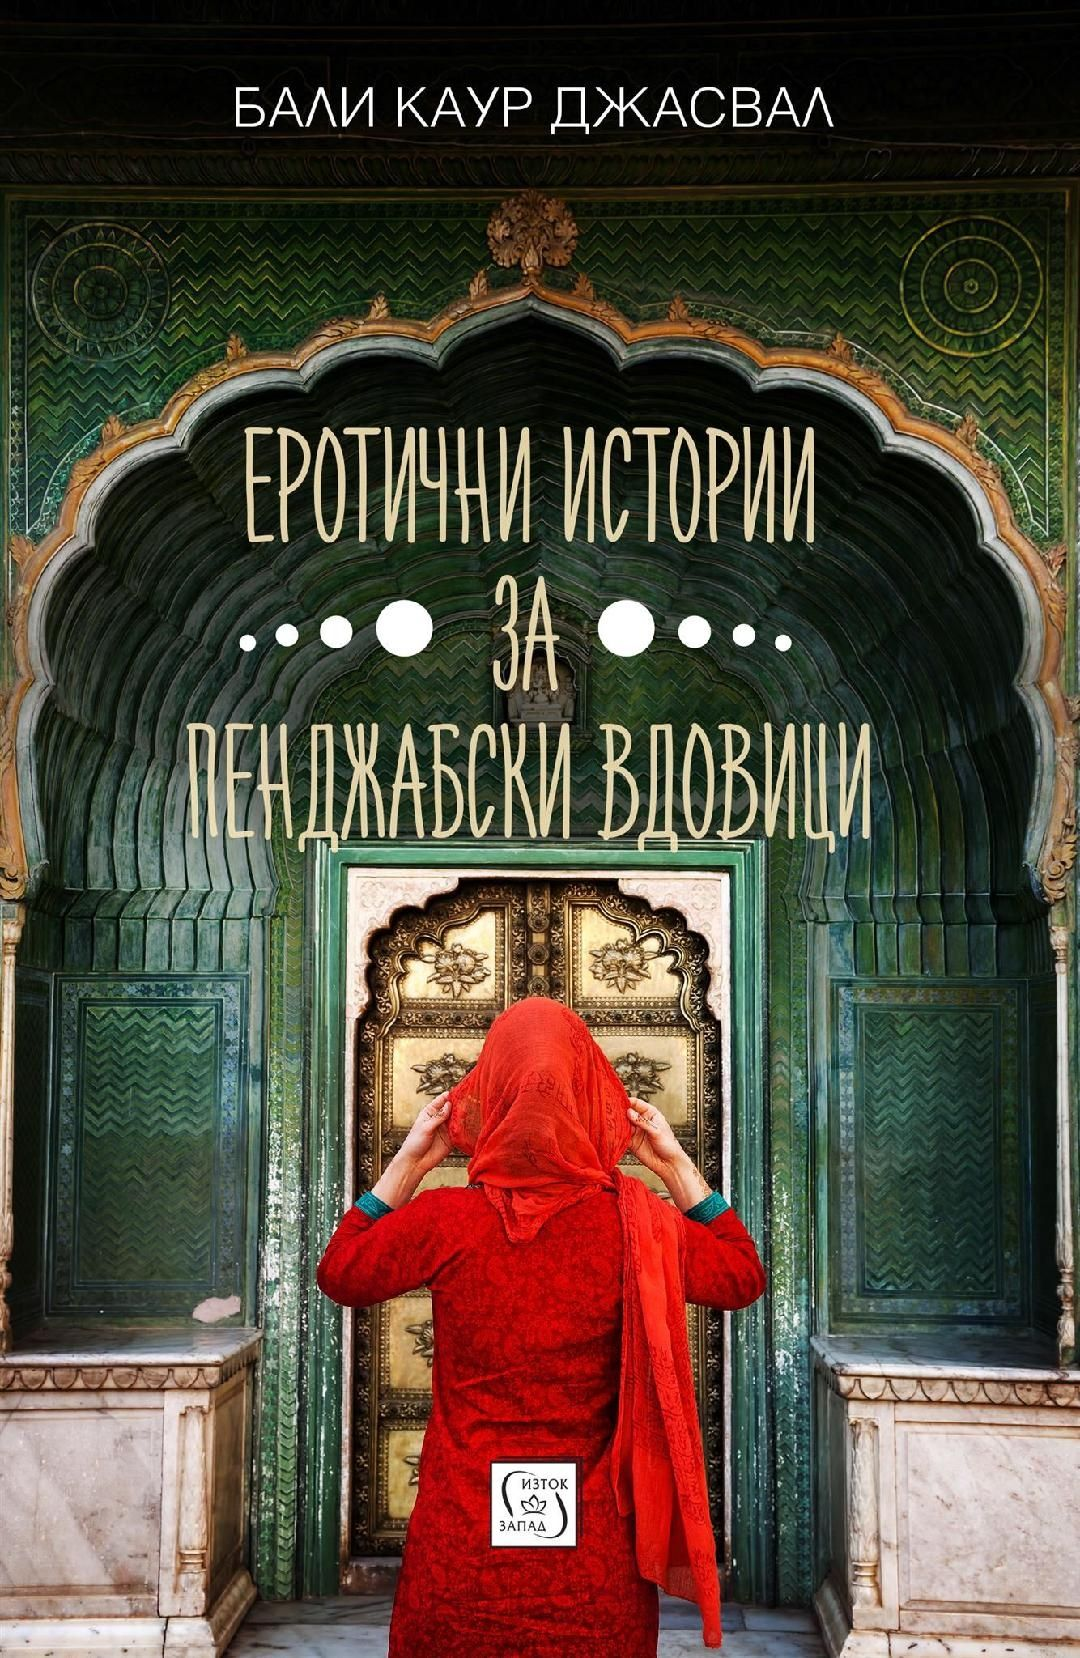 Еротични истории за пенджабски вдовици - 1